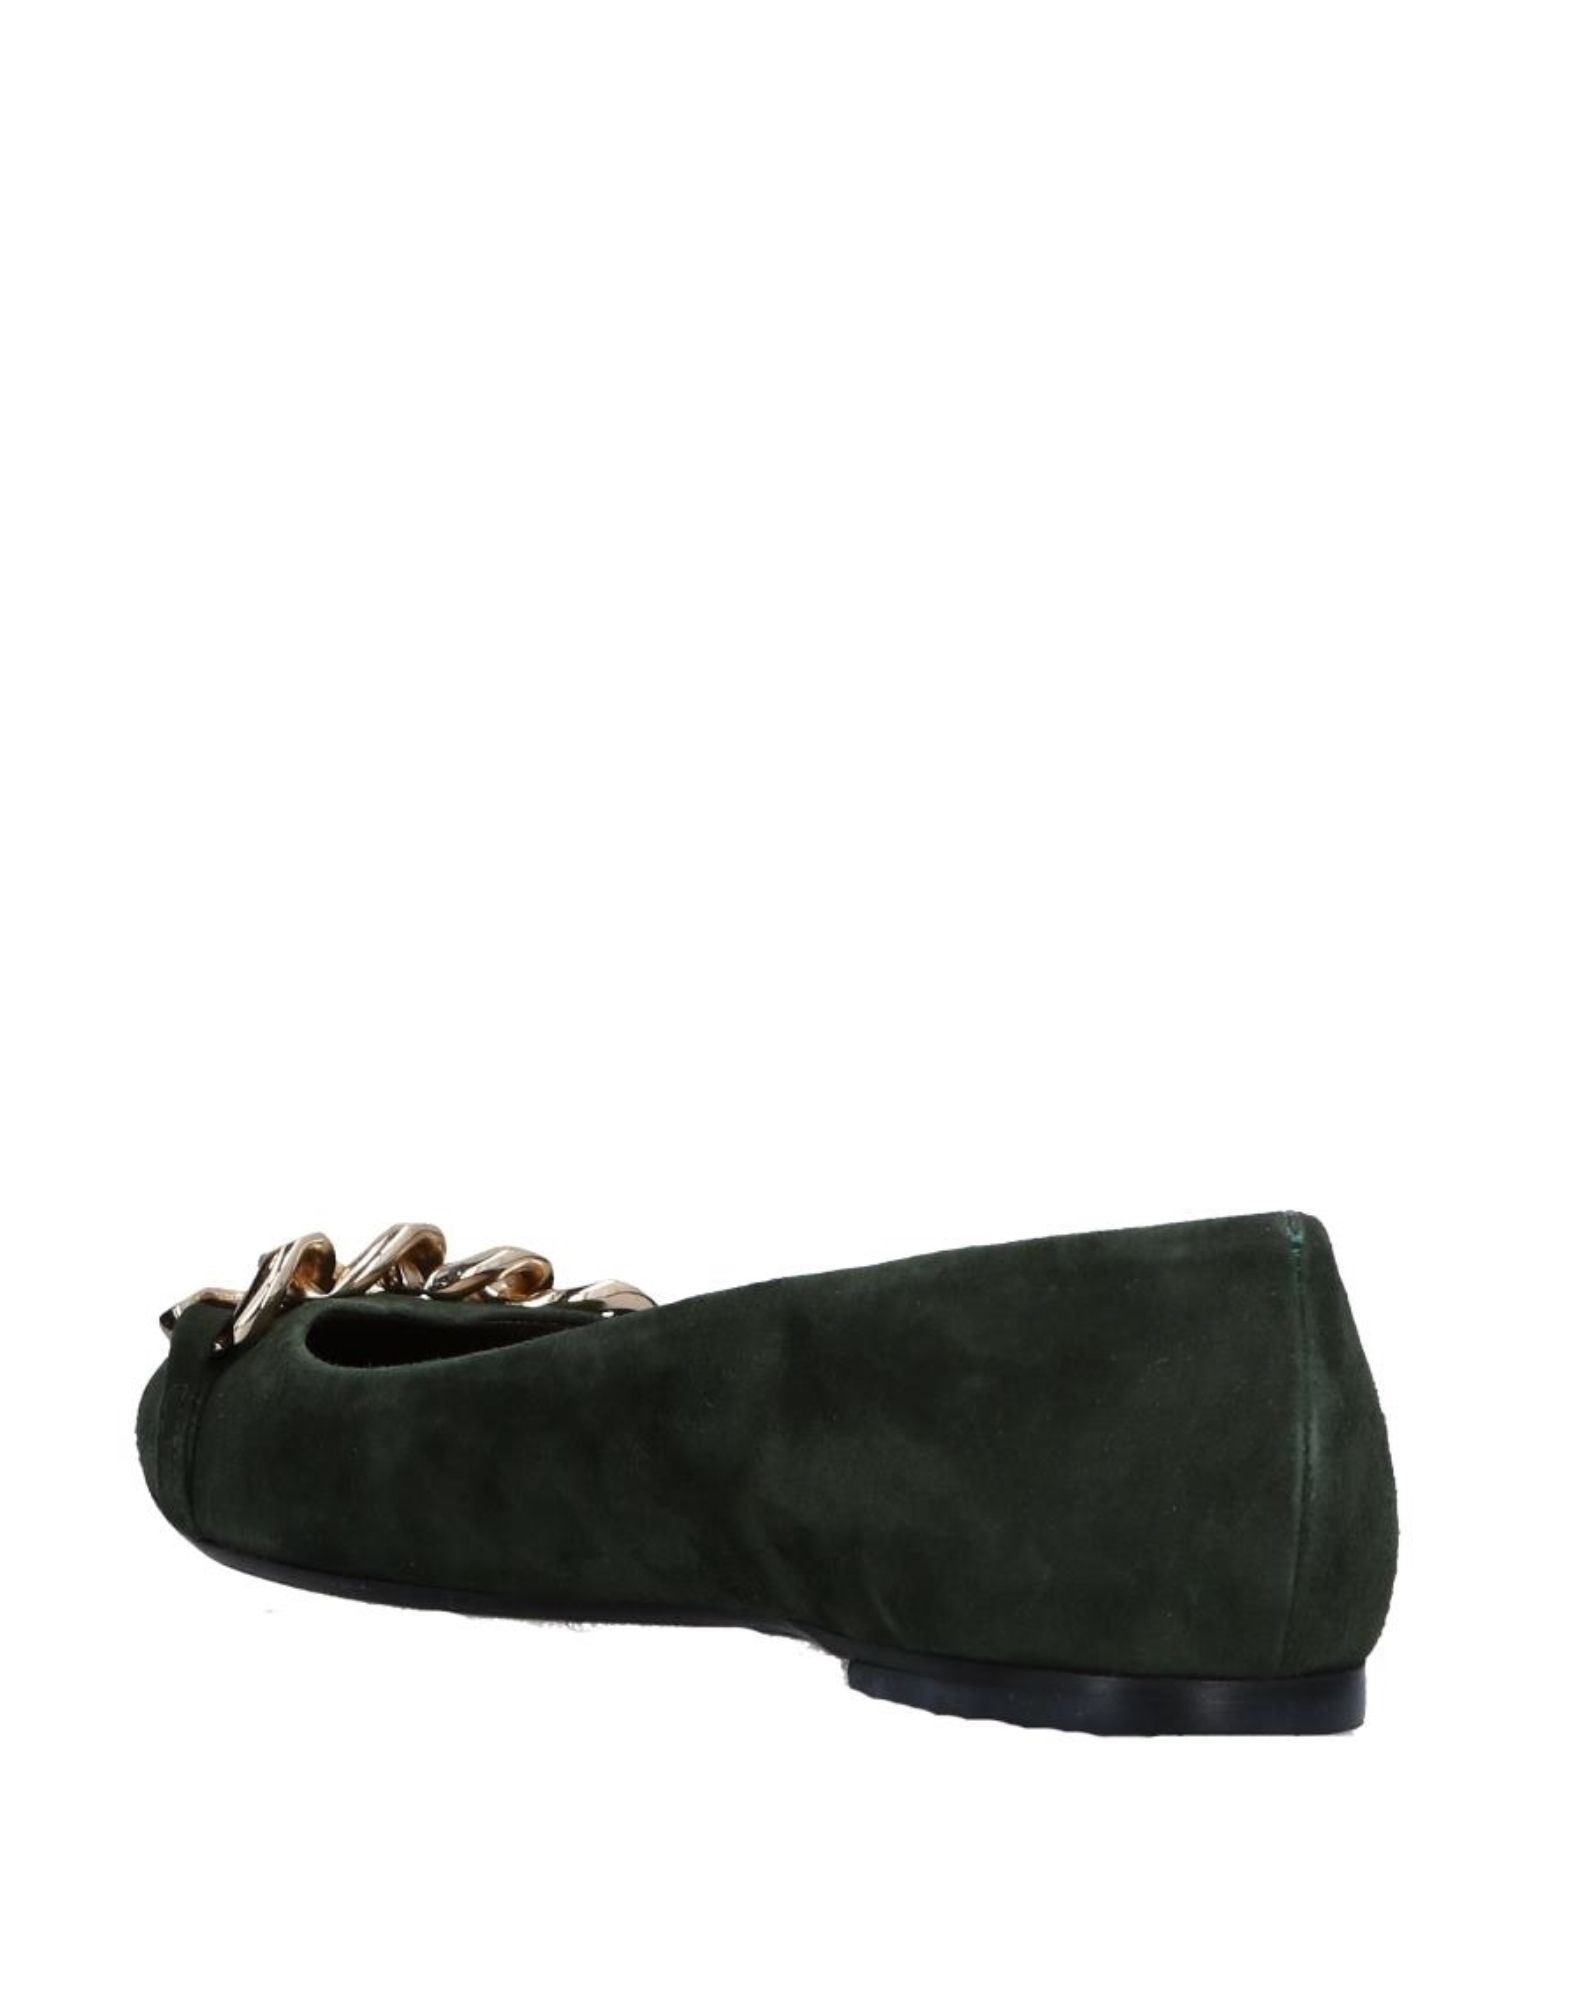 Fabio Rusconi Ballerinas Damen  11532455XE Gute Qualität beliebte Schuhe